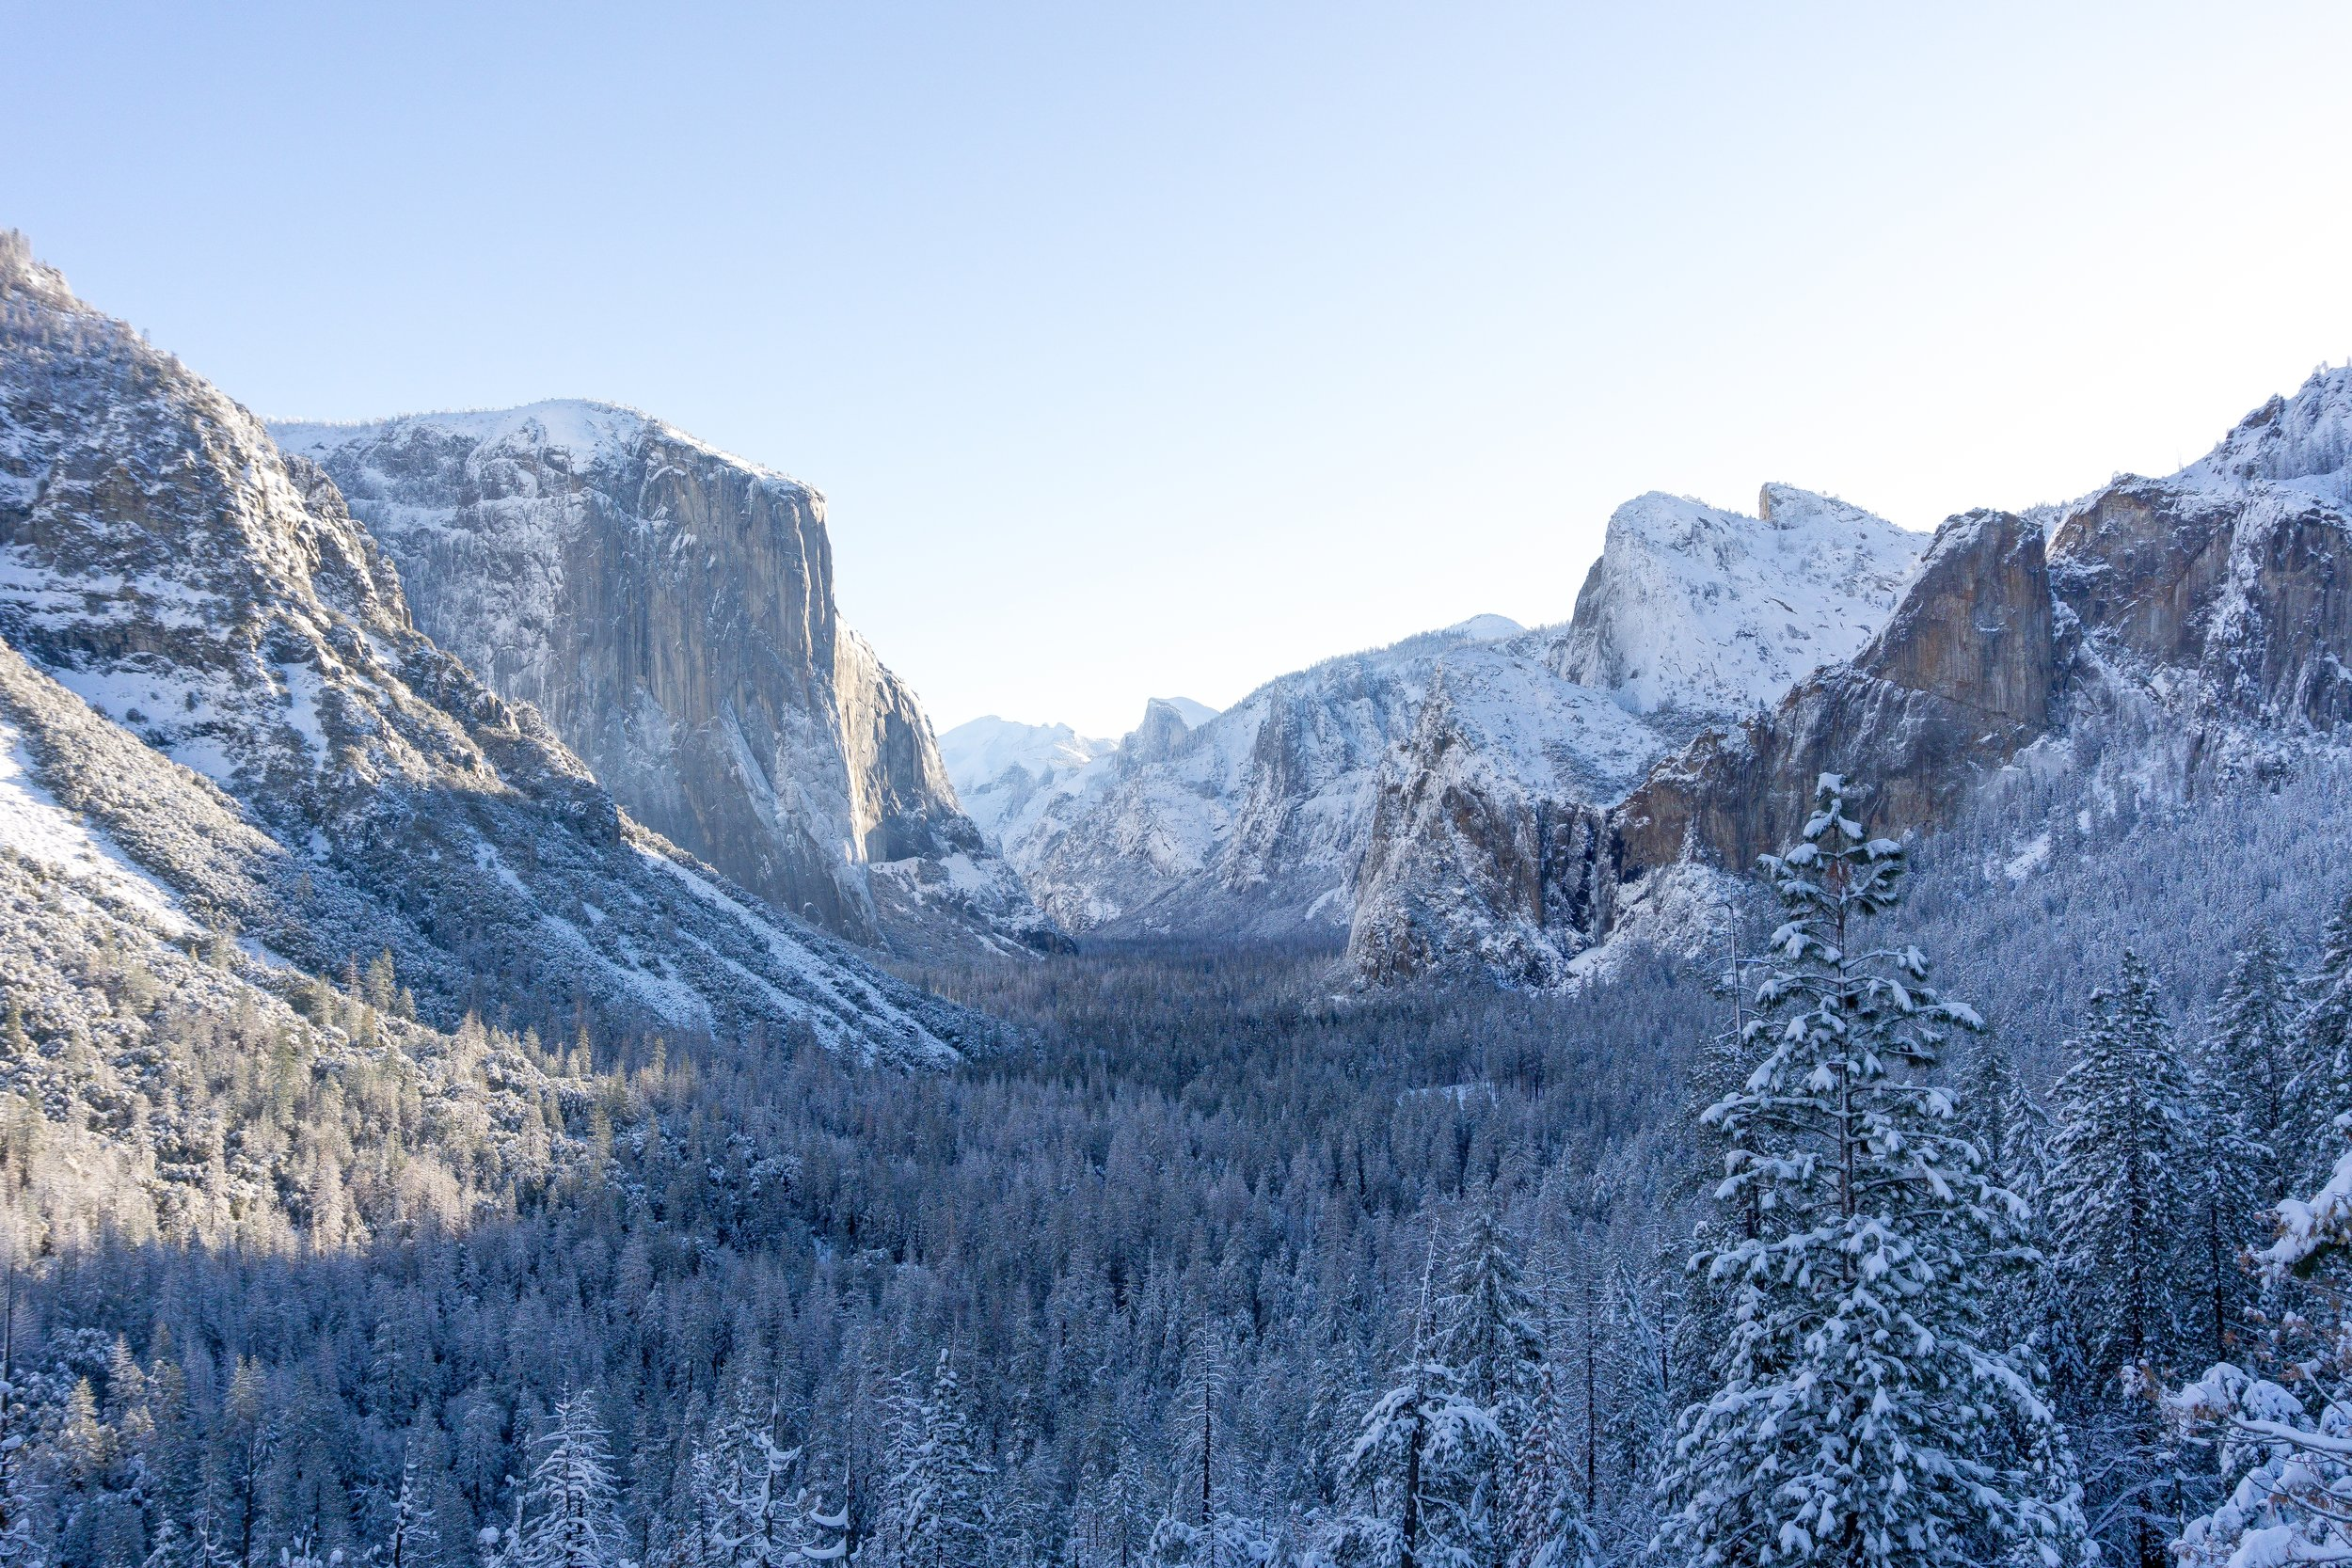 yosemite valley - Winter 2018